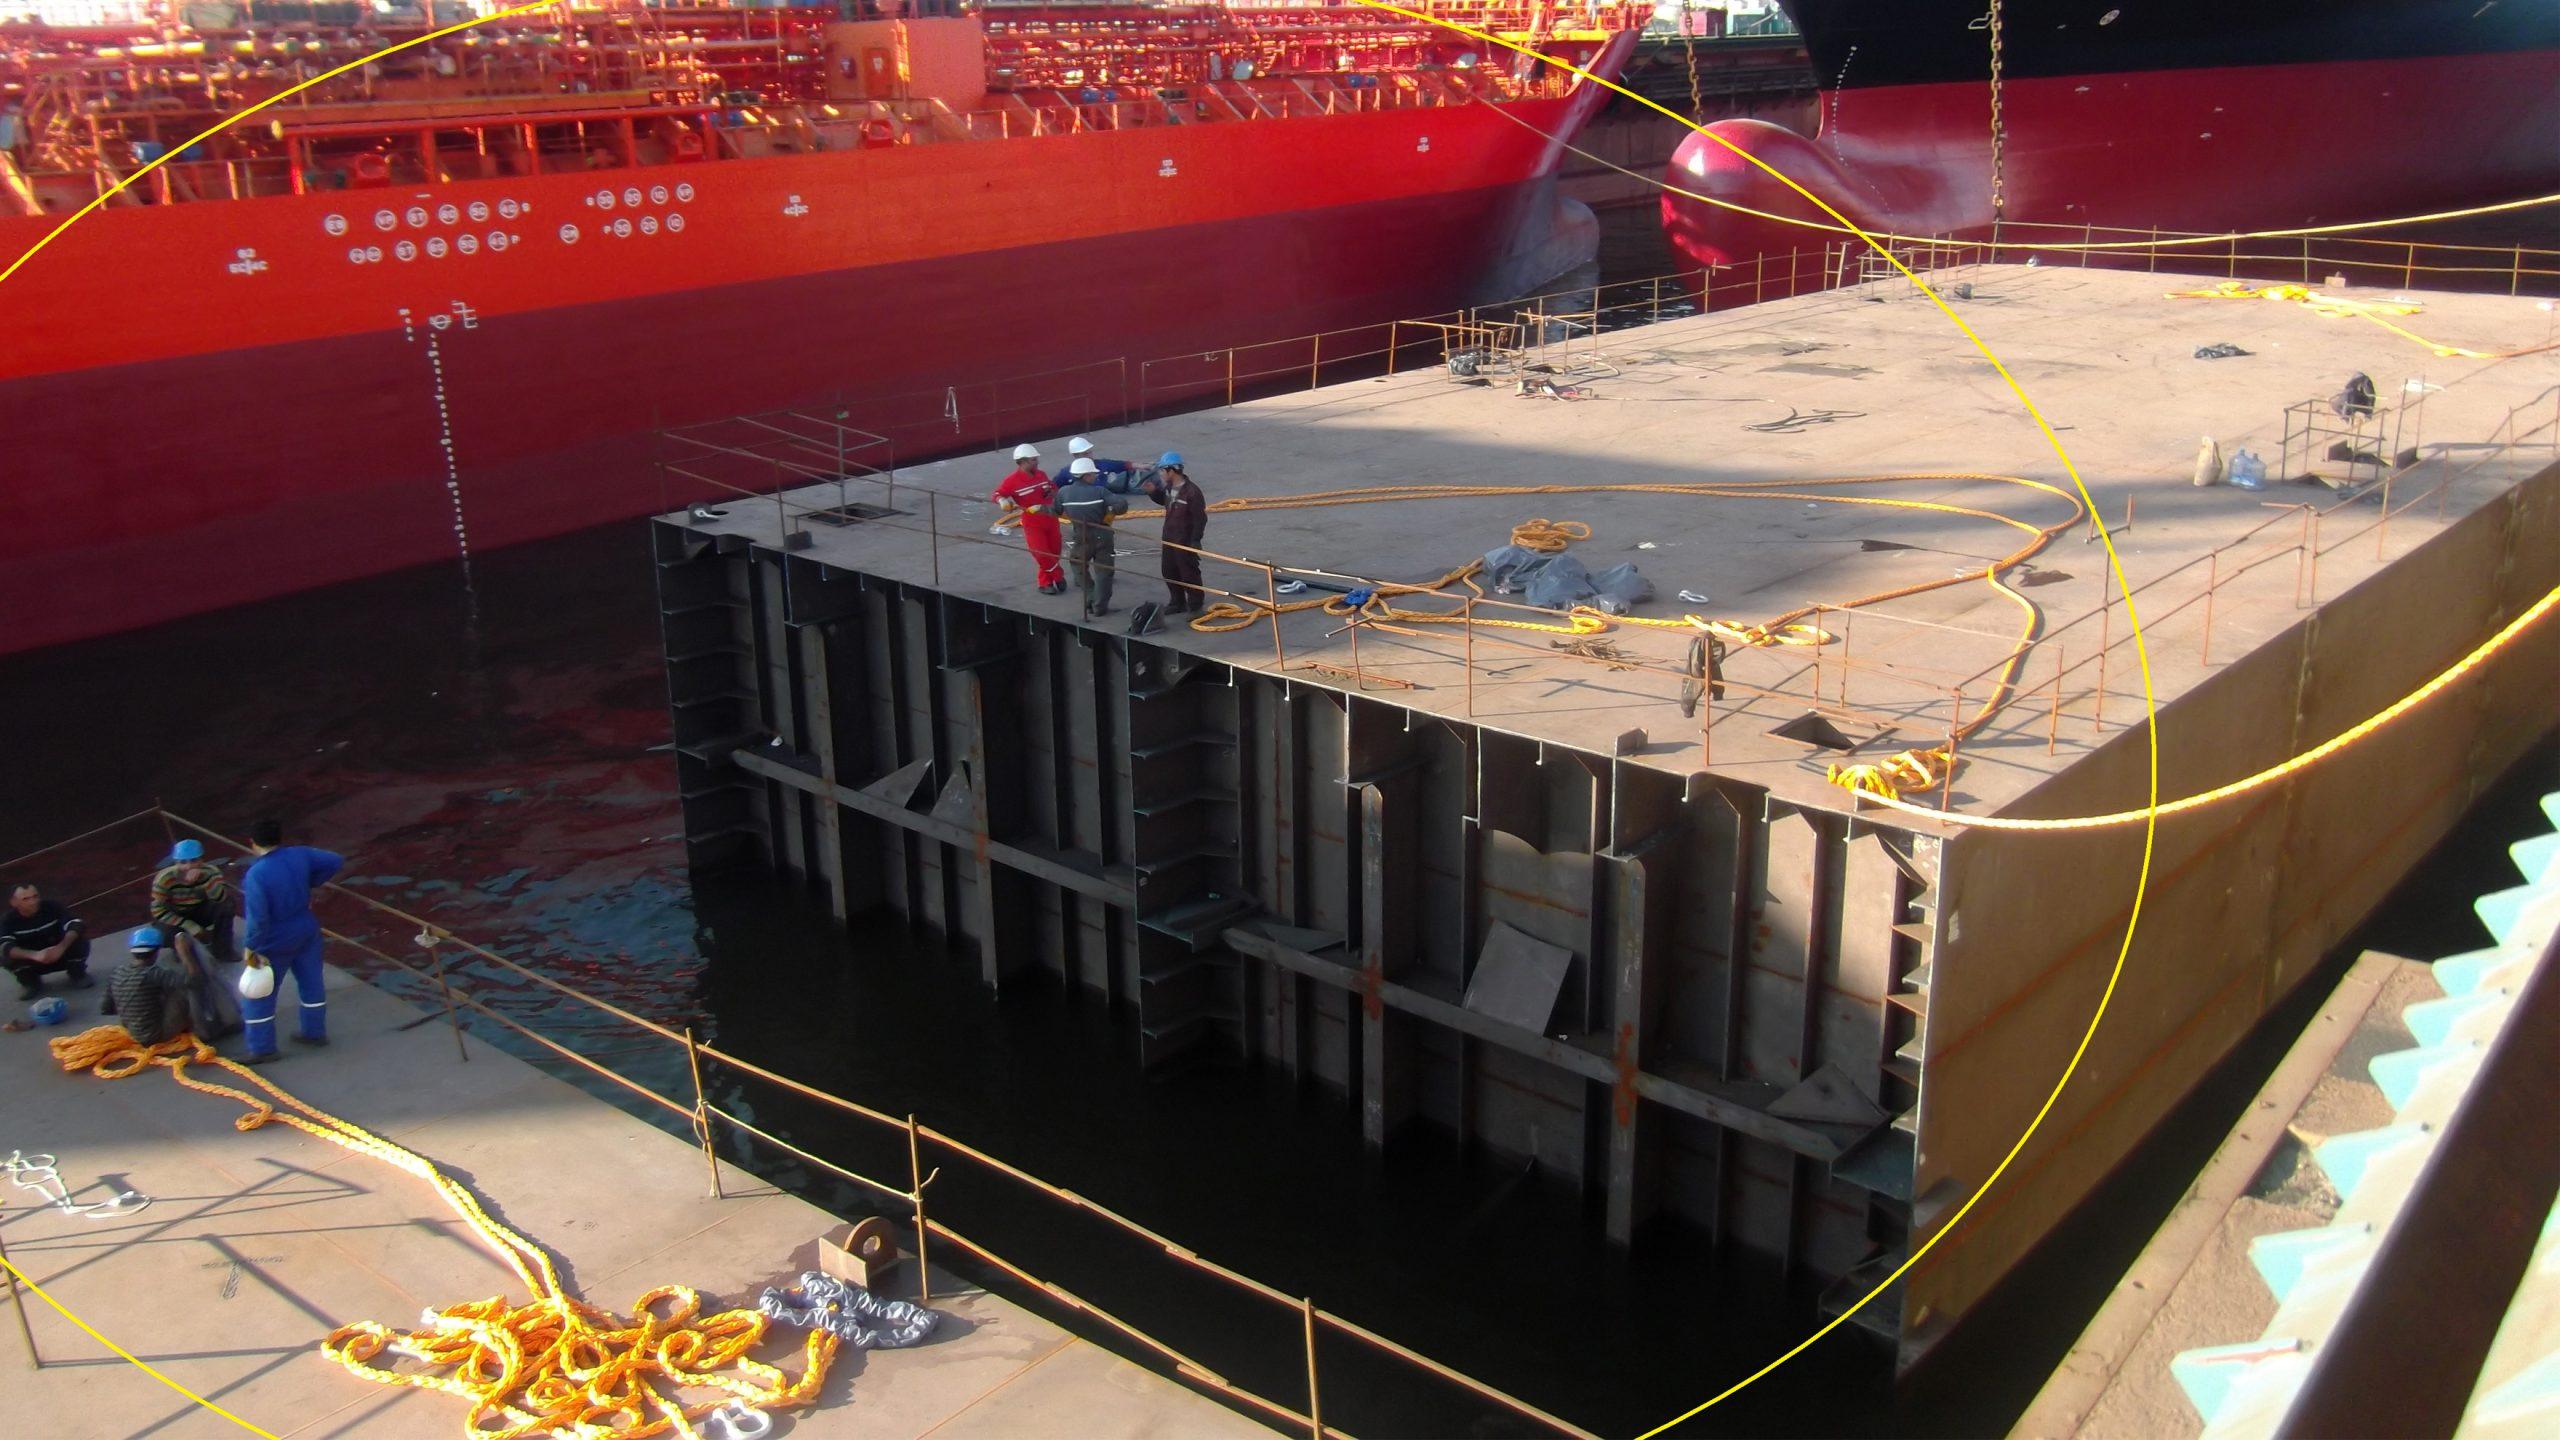 100 X 35 Metre Pontoon Barge İnşaası- Captain Lychkin